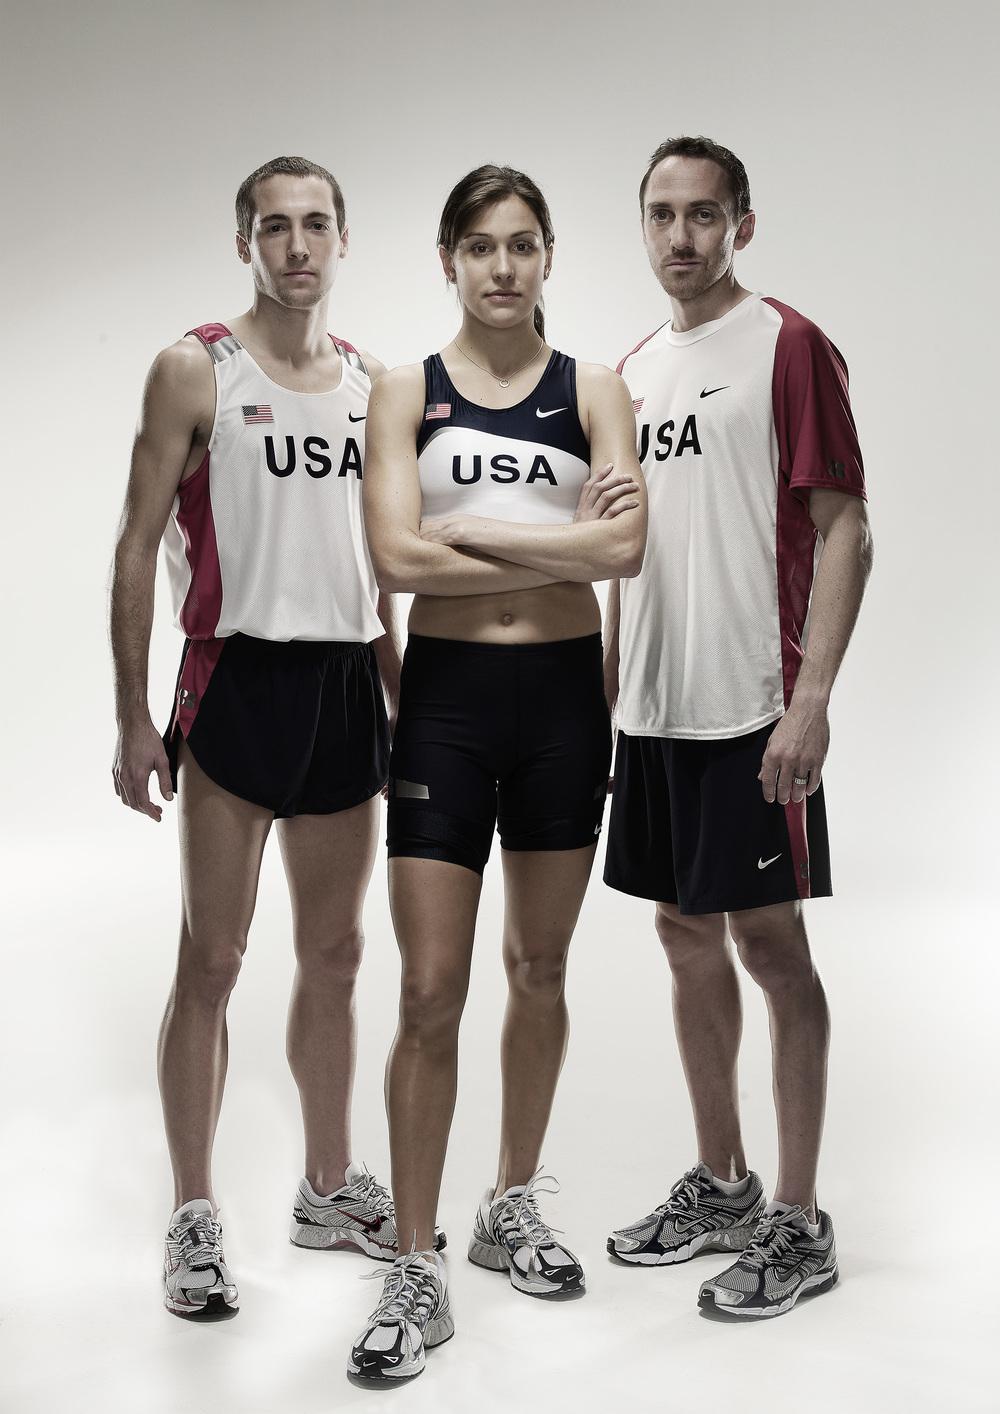 US_ATF_Athletes_926a.jpg